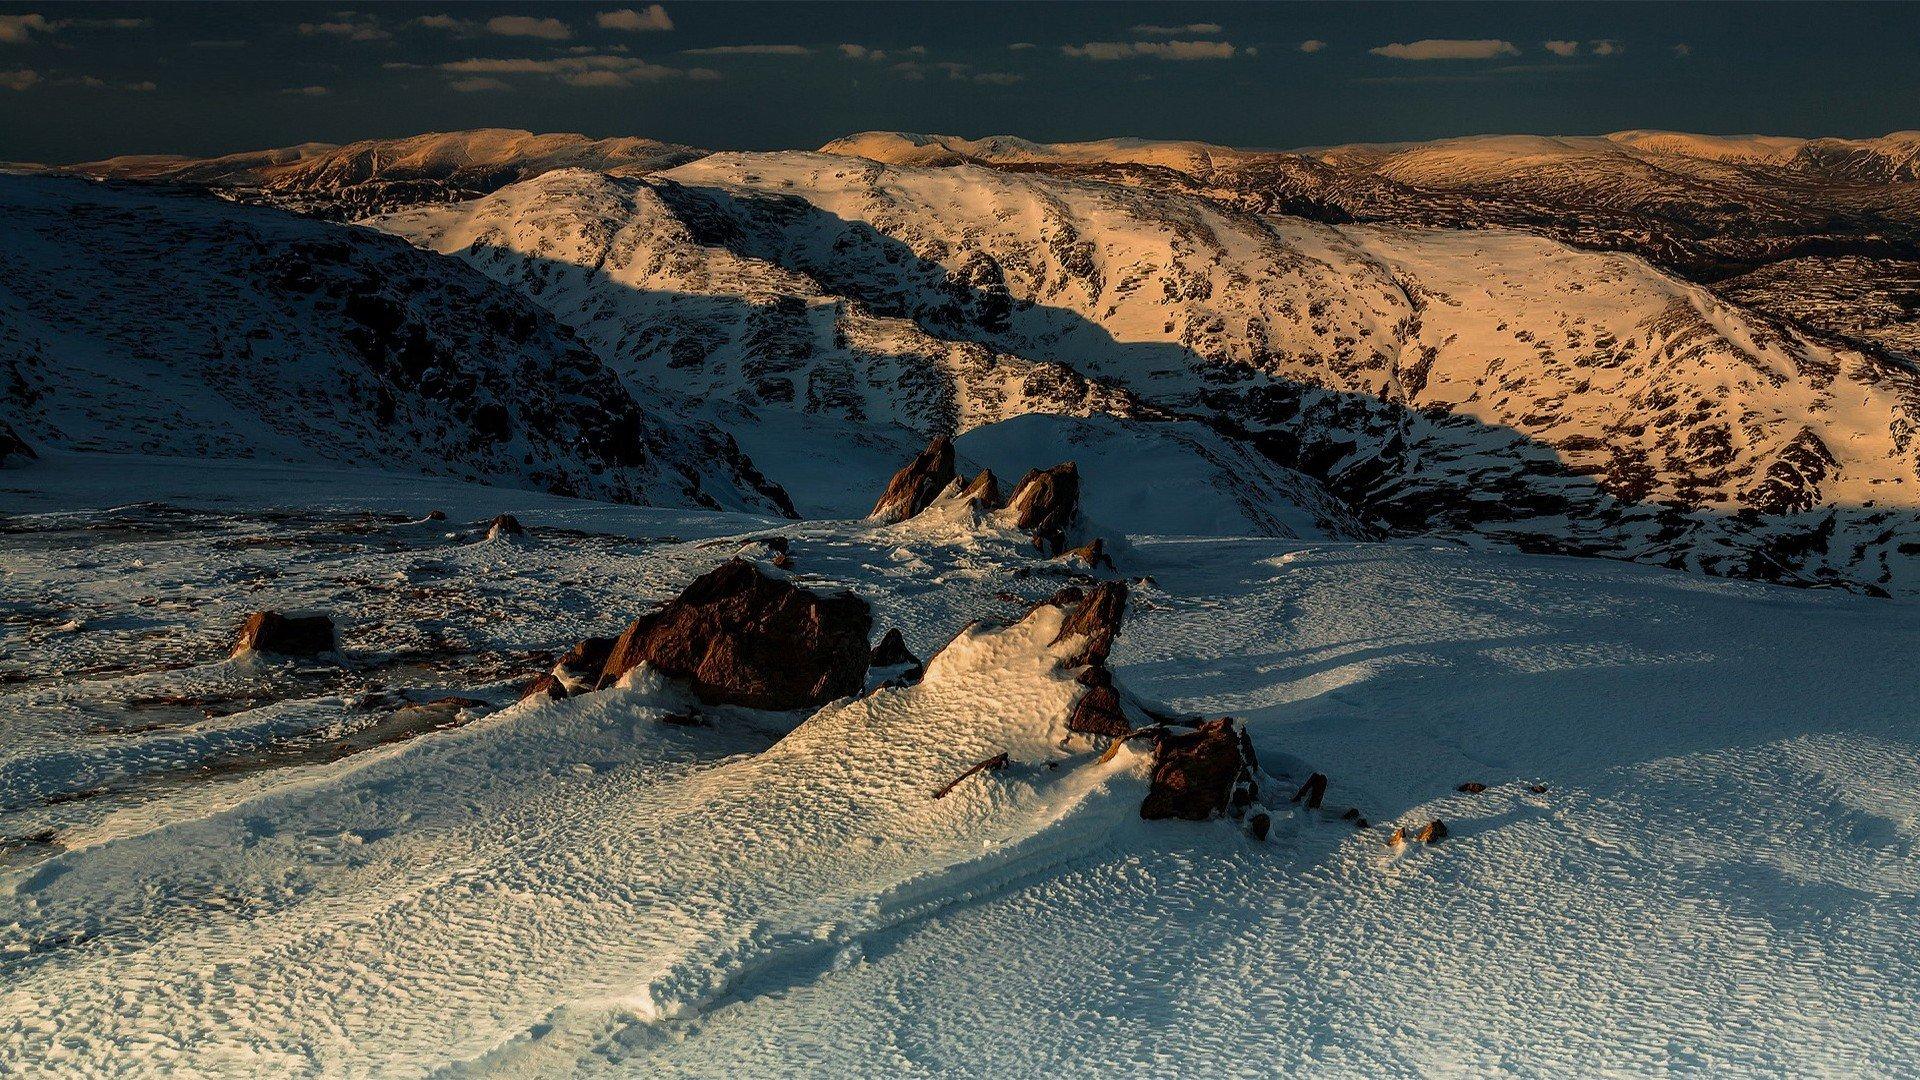 горы камни снег зима  № 2512973 бесплатно